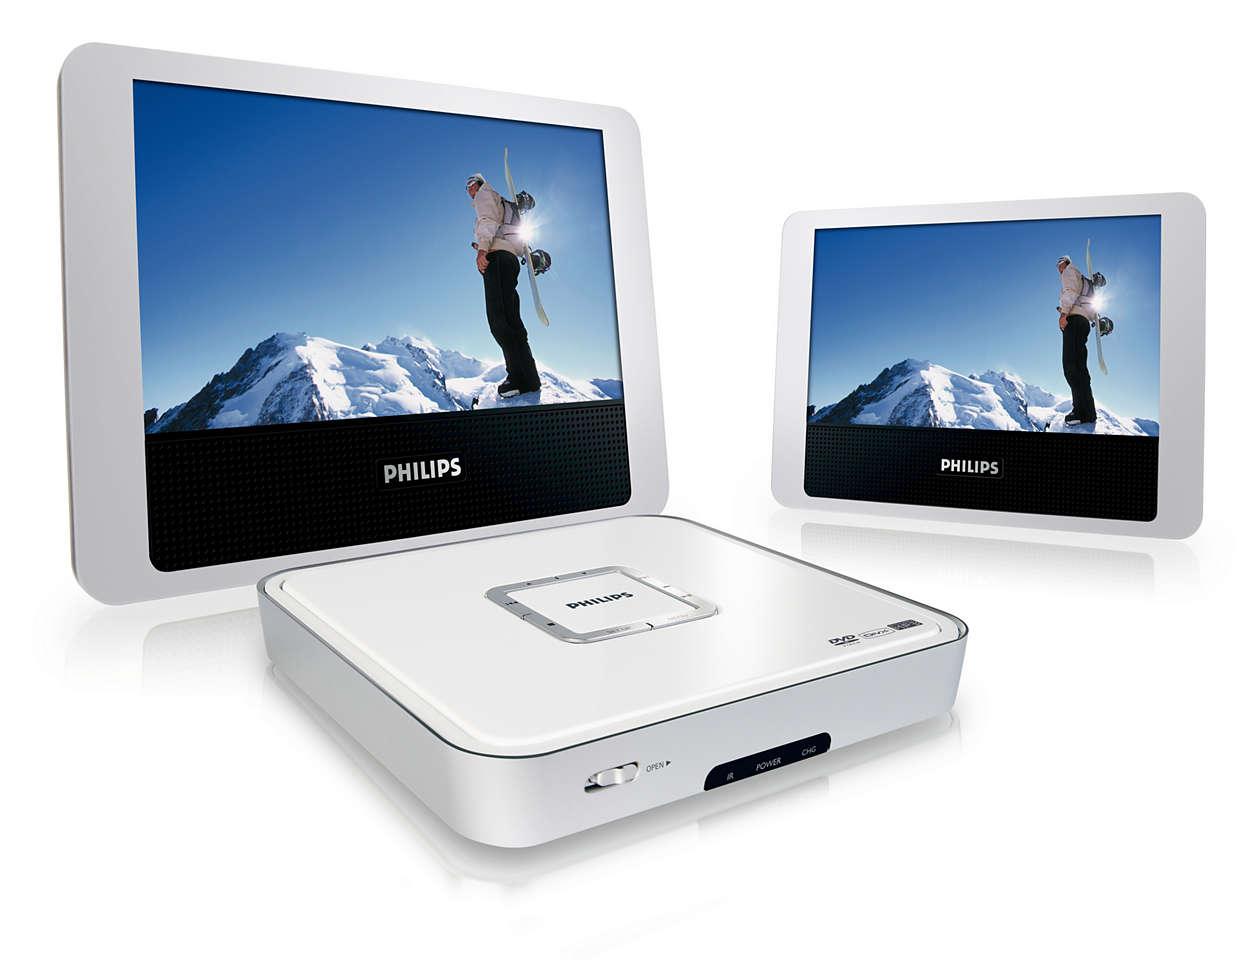 portable dvd player pet712 05 philips. Black Bedroom Furniture Sets. Home Design Ideas